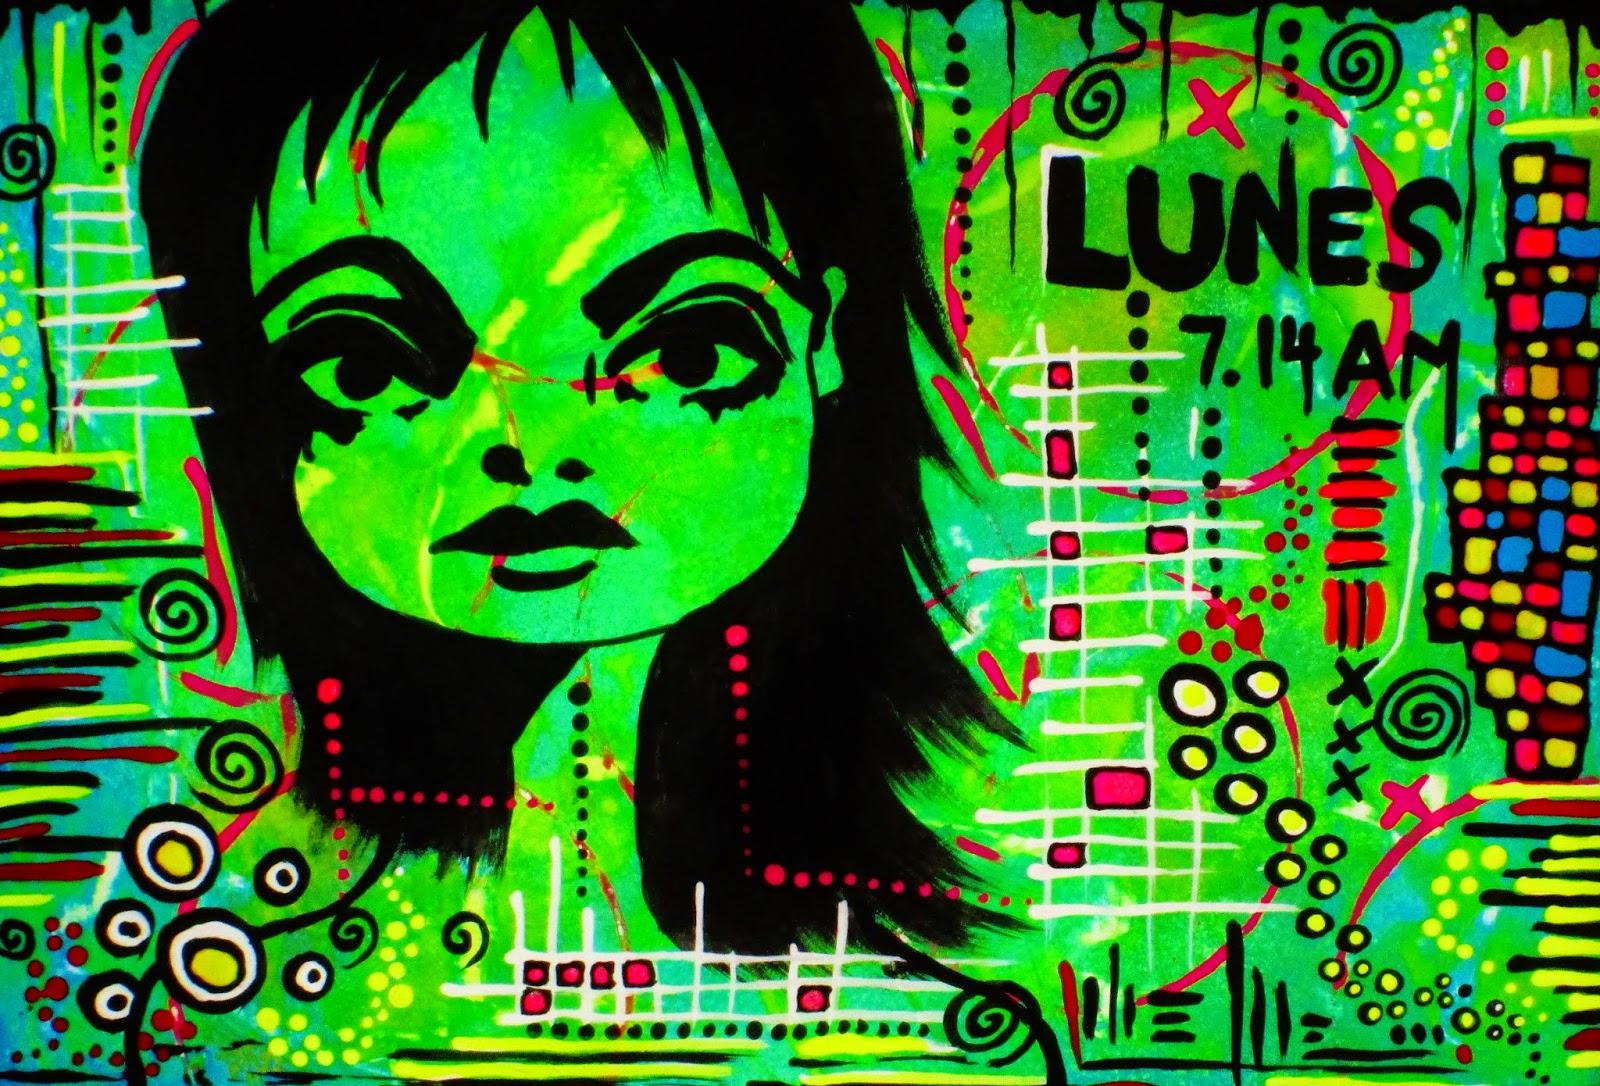 Lunes - Art by Bebee Pino